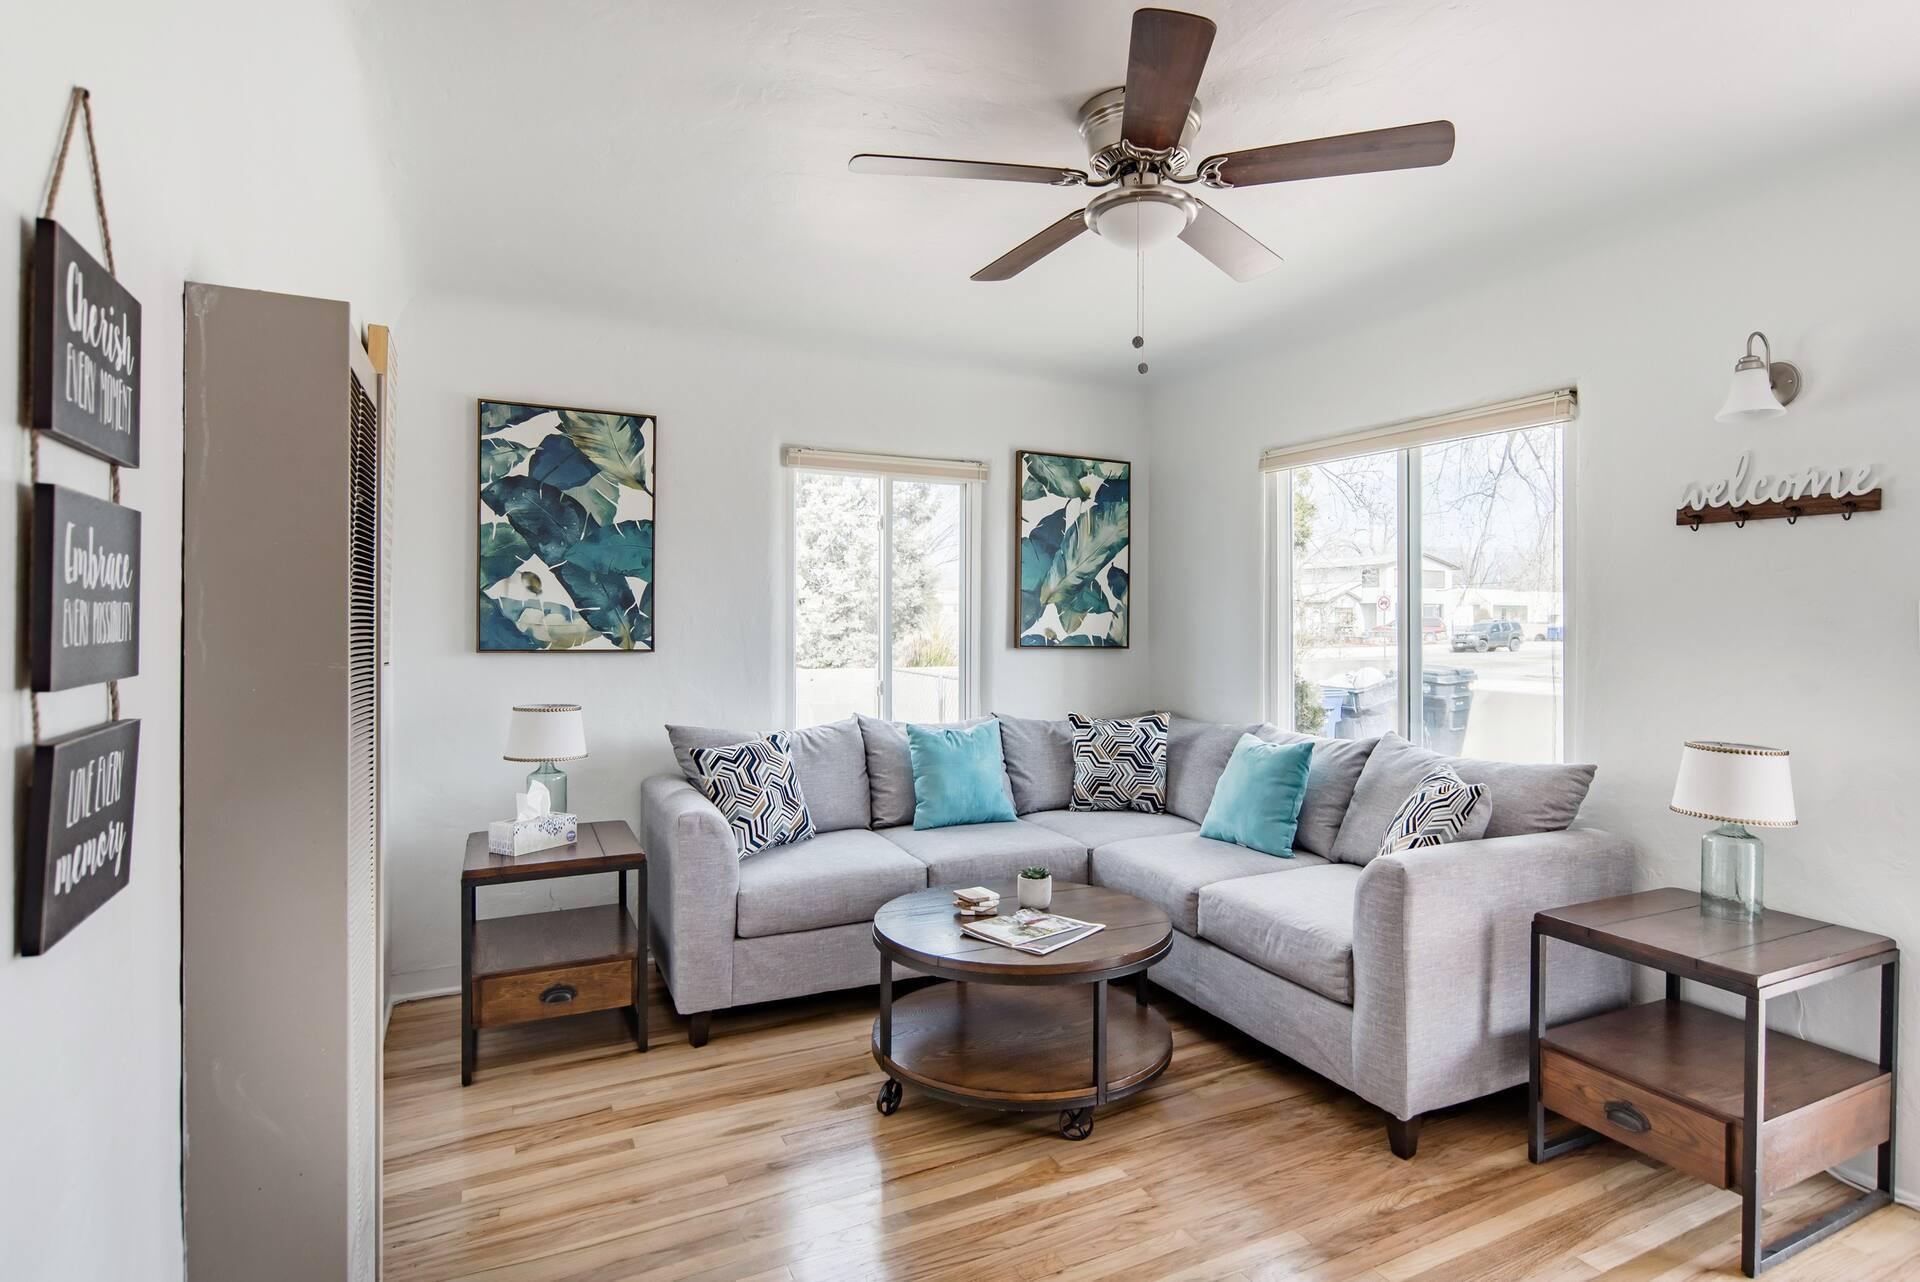 Downtown Airbnb Albuquerque